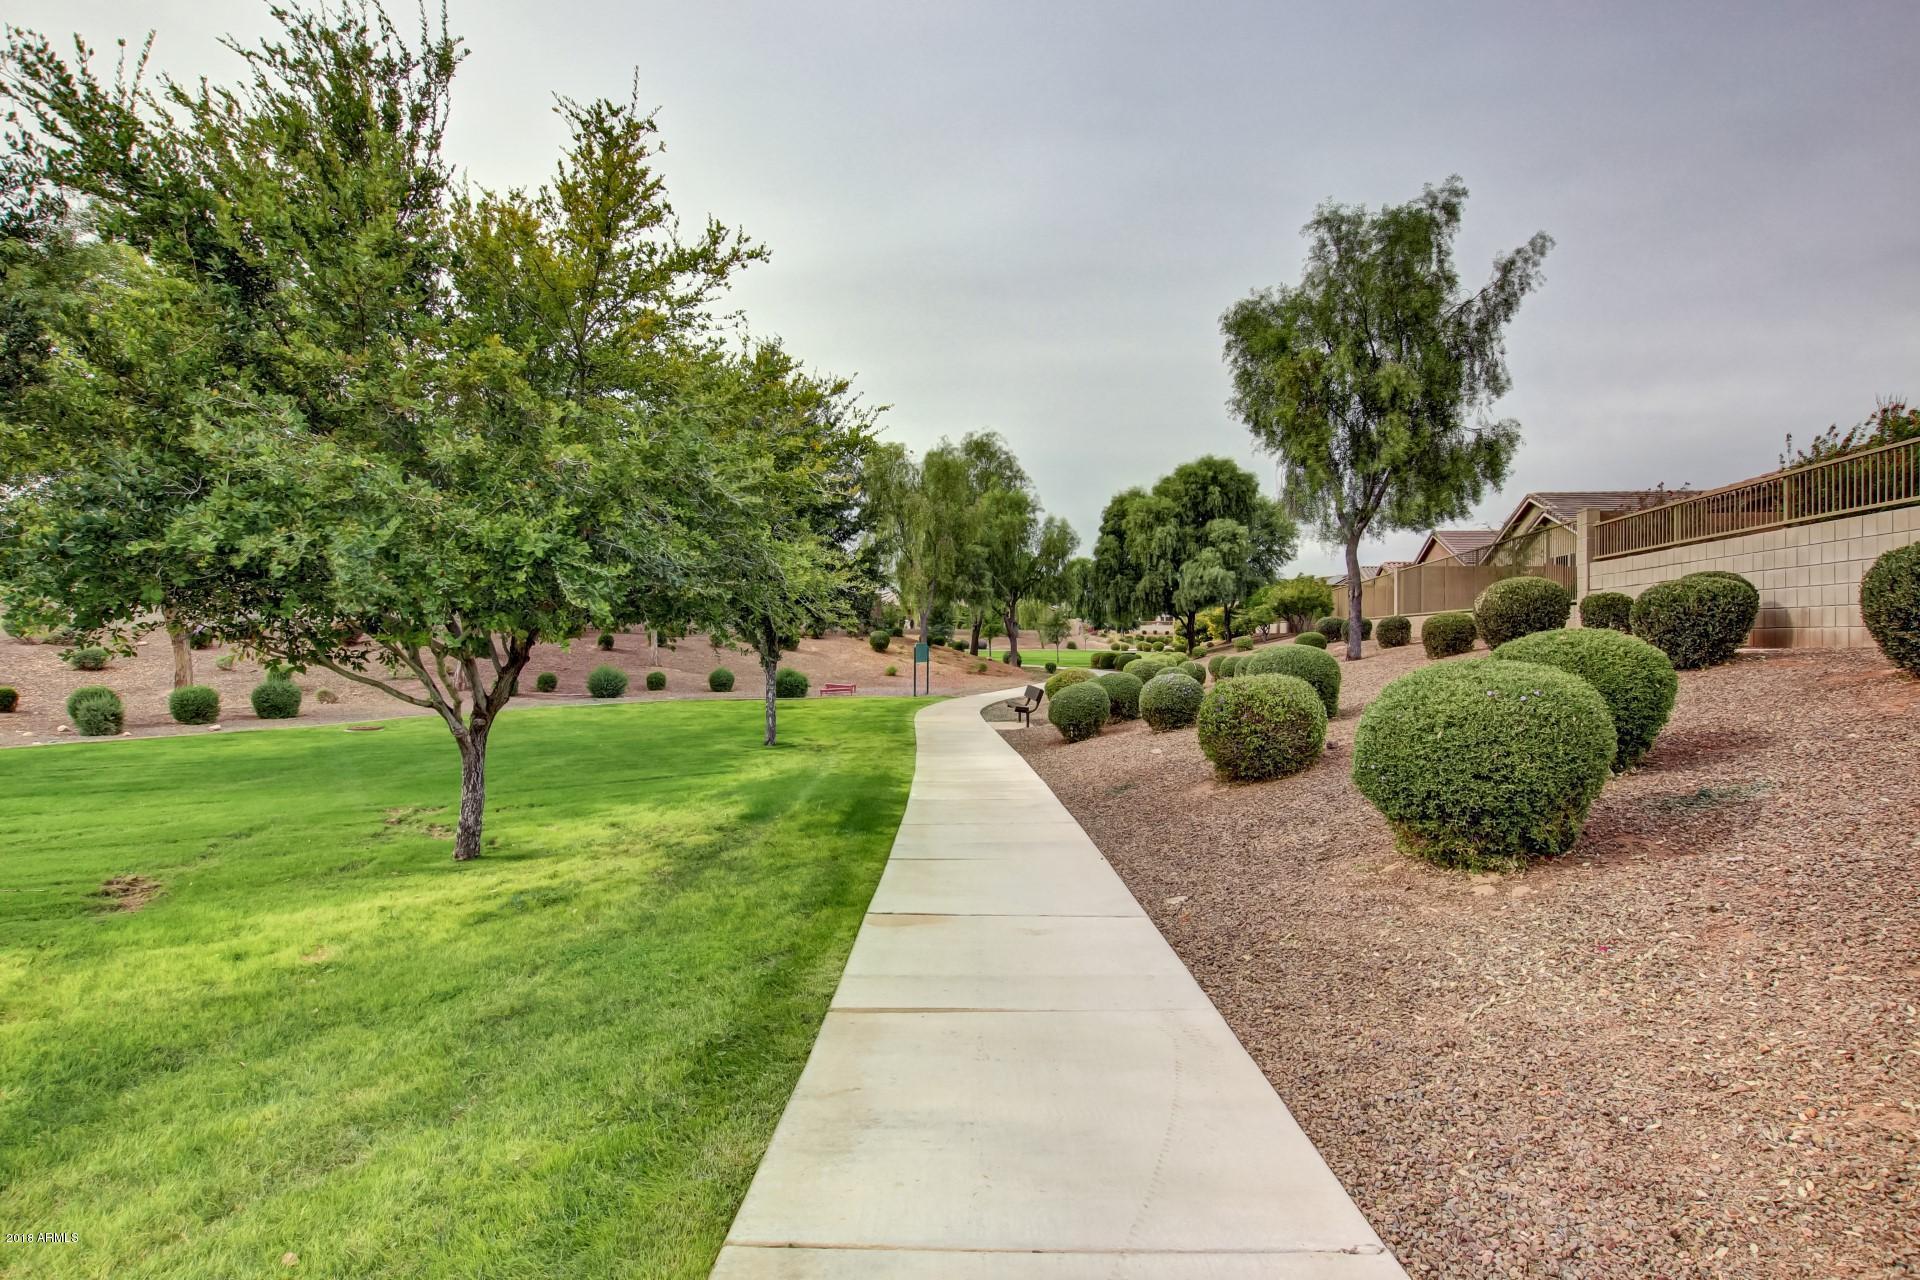 MLS 5758833 12248 W Prickly Pear Trail, Peoria, AZ 85383 Peoria AZ Short Sale